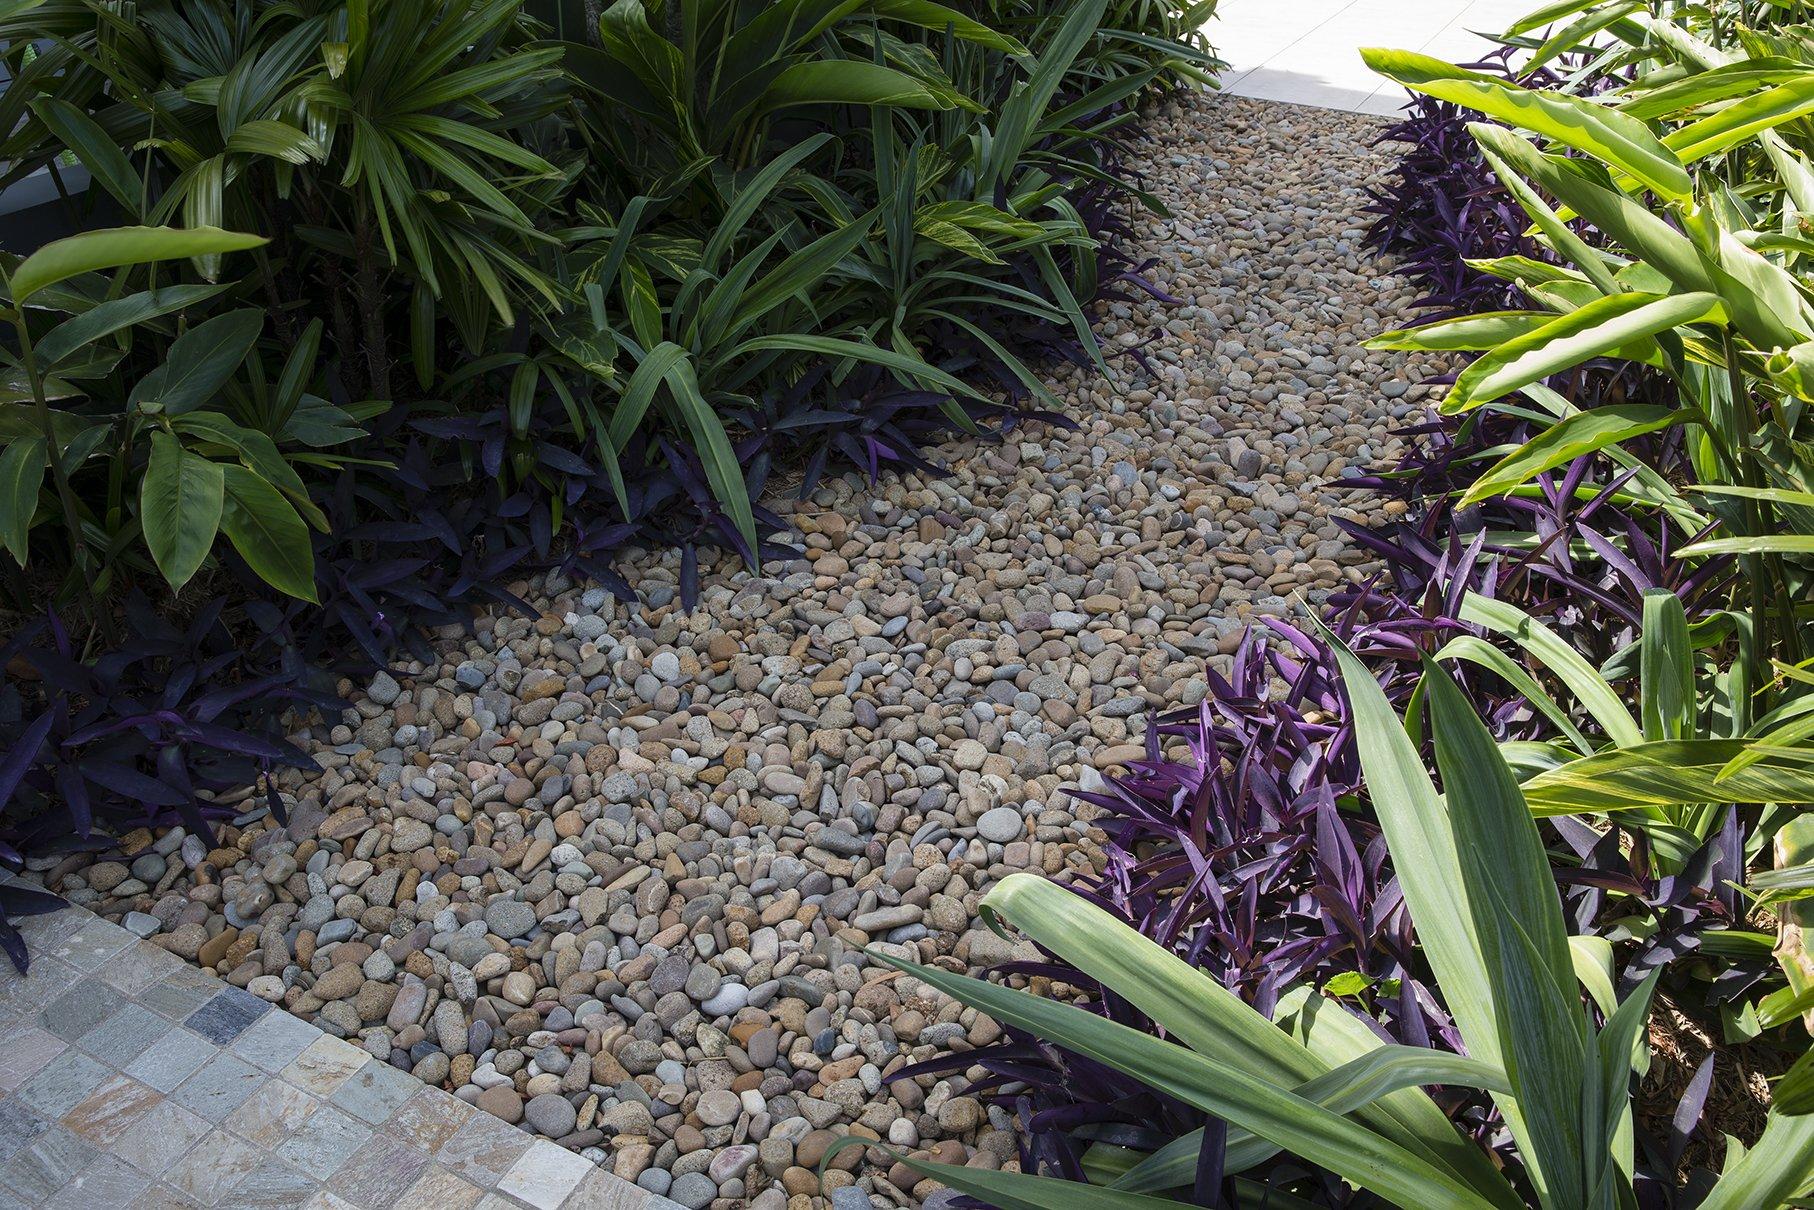 Garden landscape of stones and shrubs